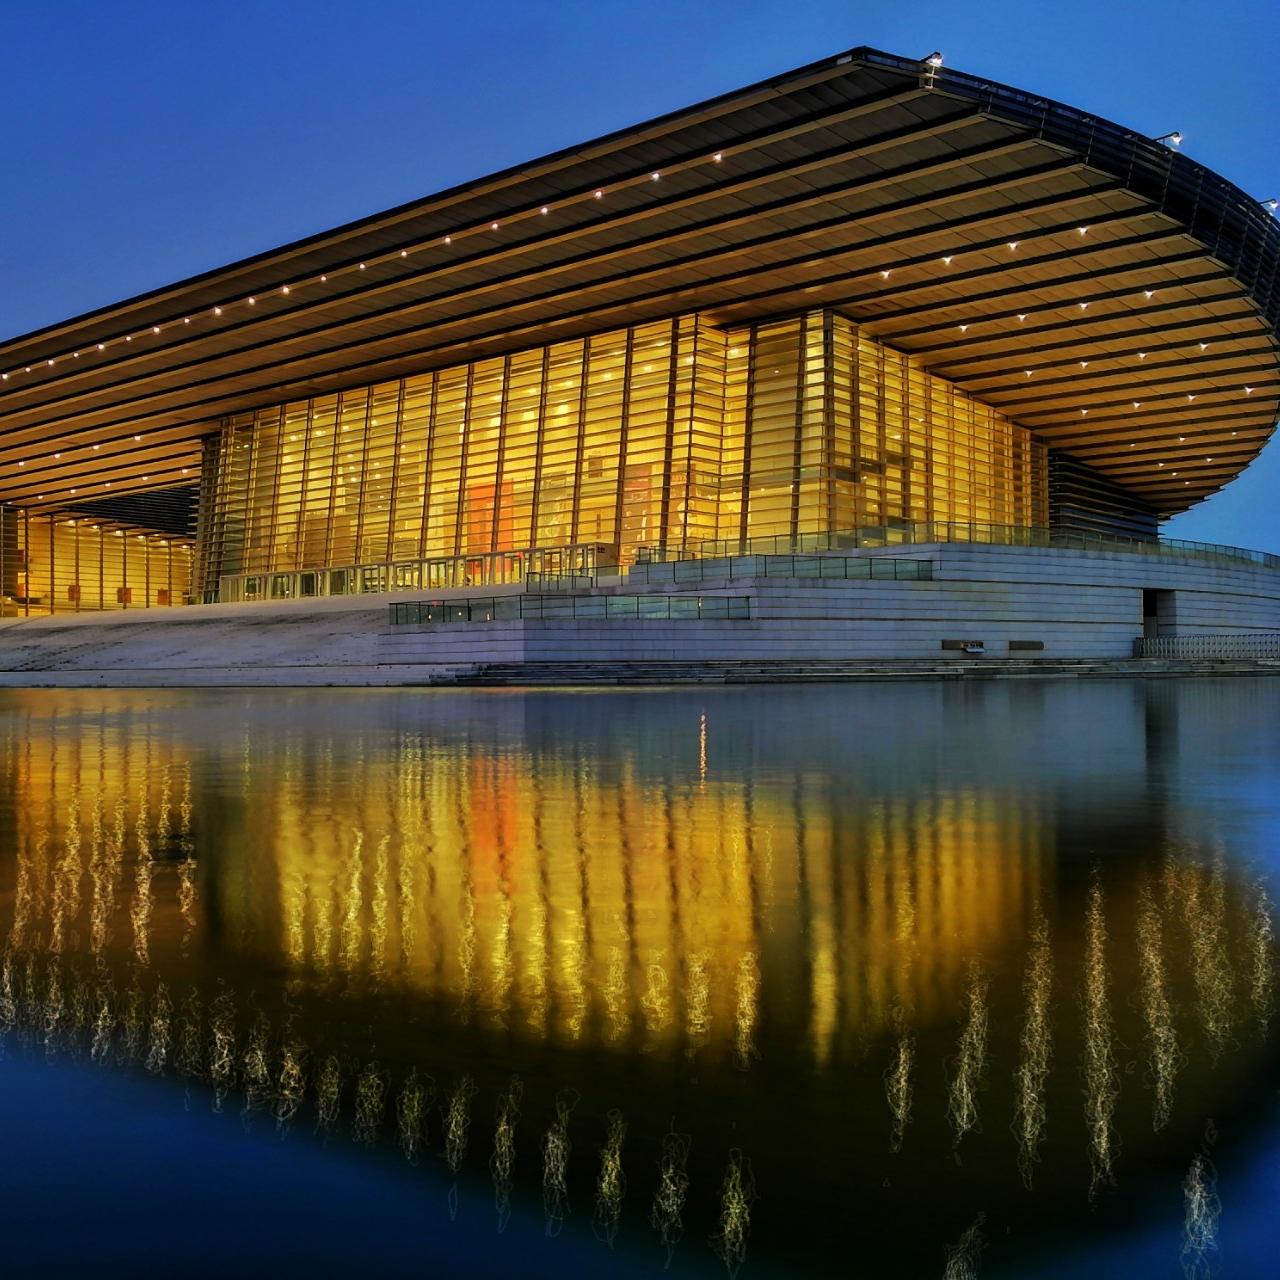 驚艷凡爾賽ii VersailleS II - 天津大劇院Tianjin Grand Theatre24 April, 2019